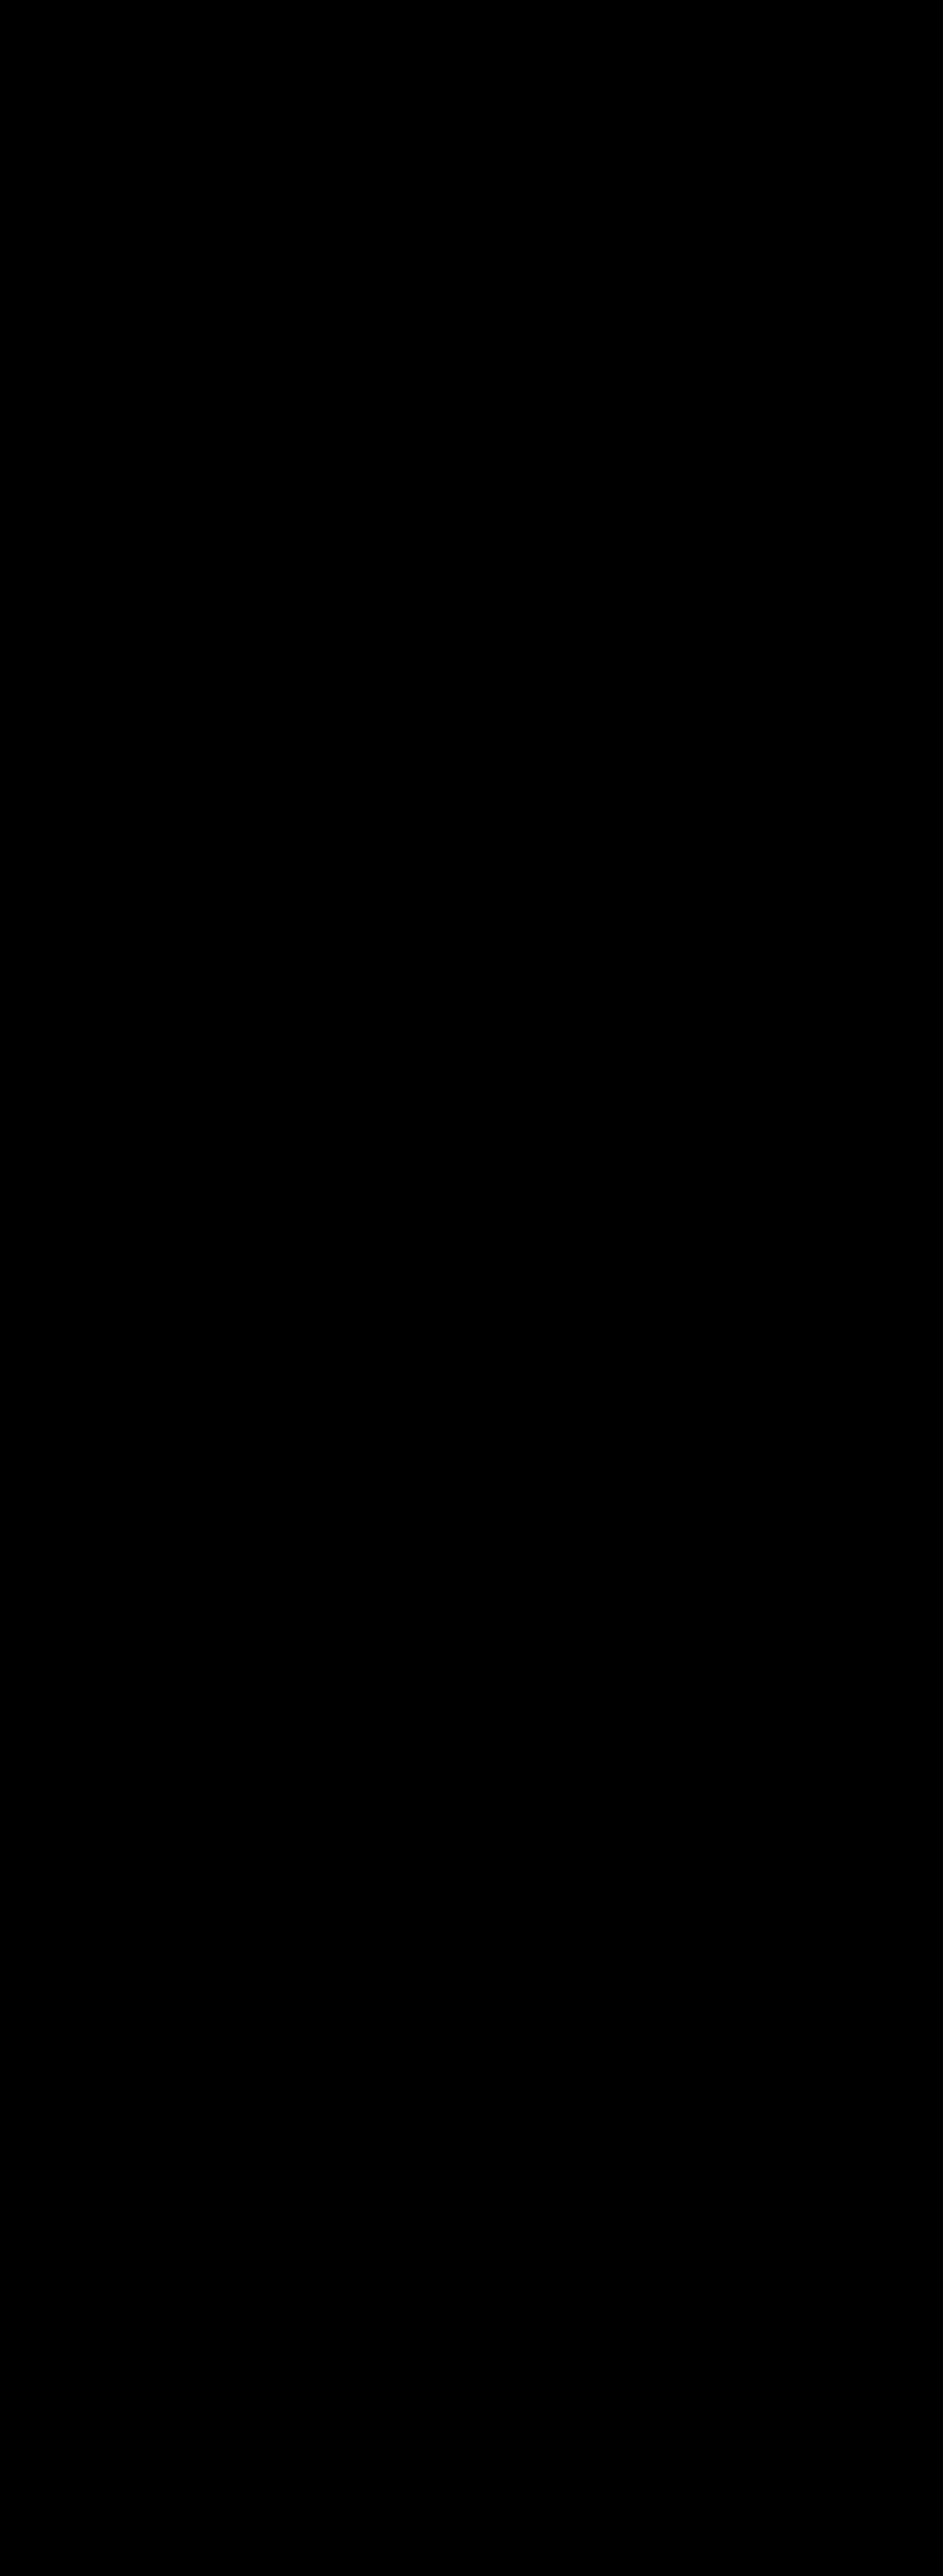 Individual_element-31